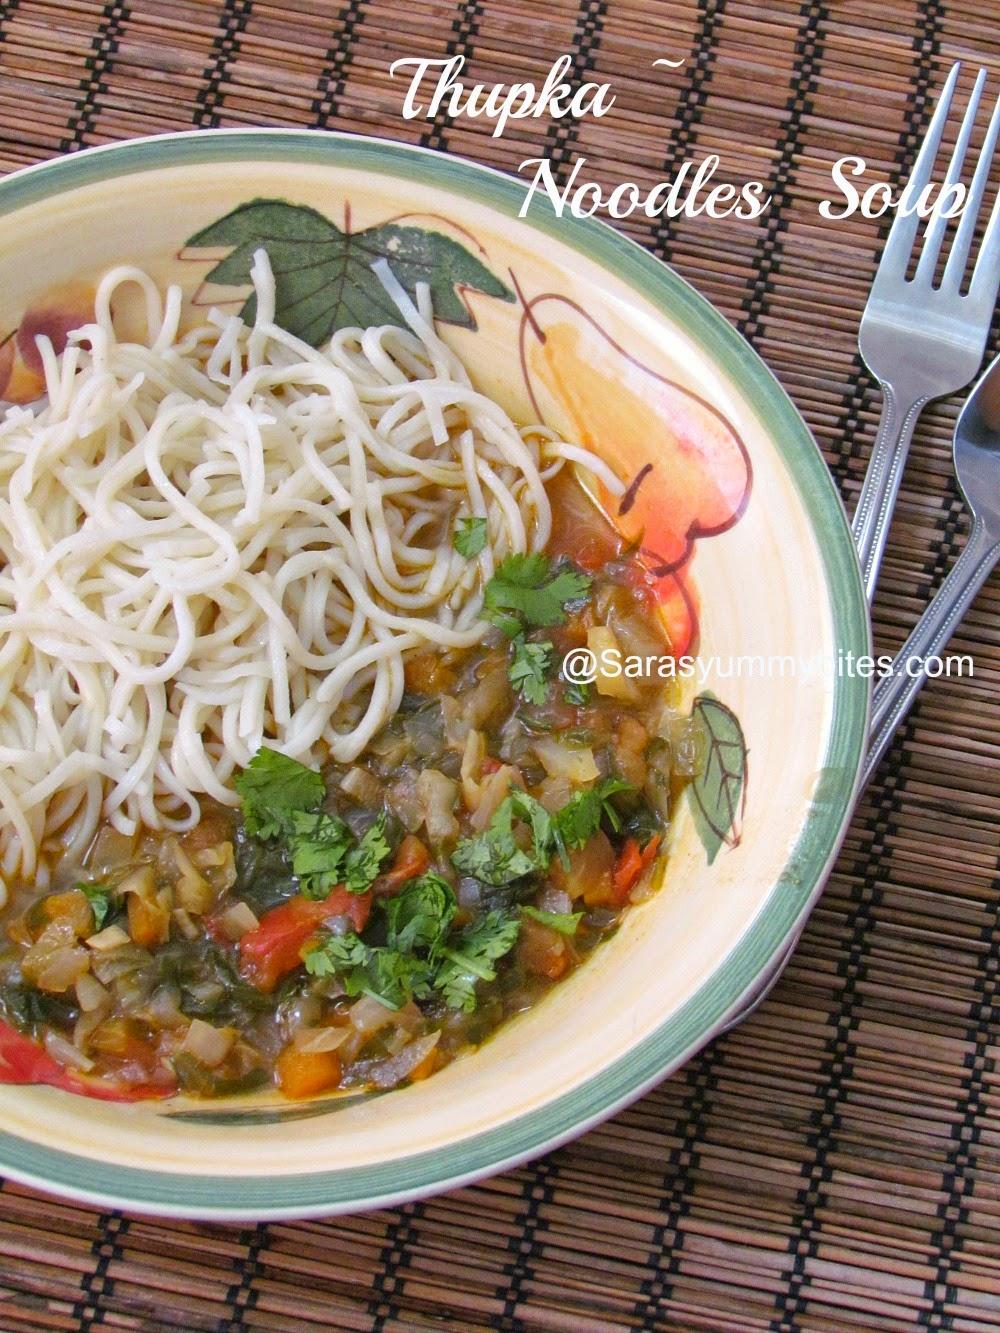 Thupka noodles soup of arunachal pradesh sarasyummybites for Arunachal pradesh cuisine